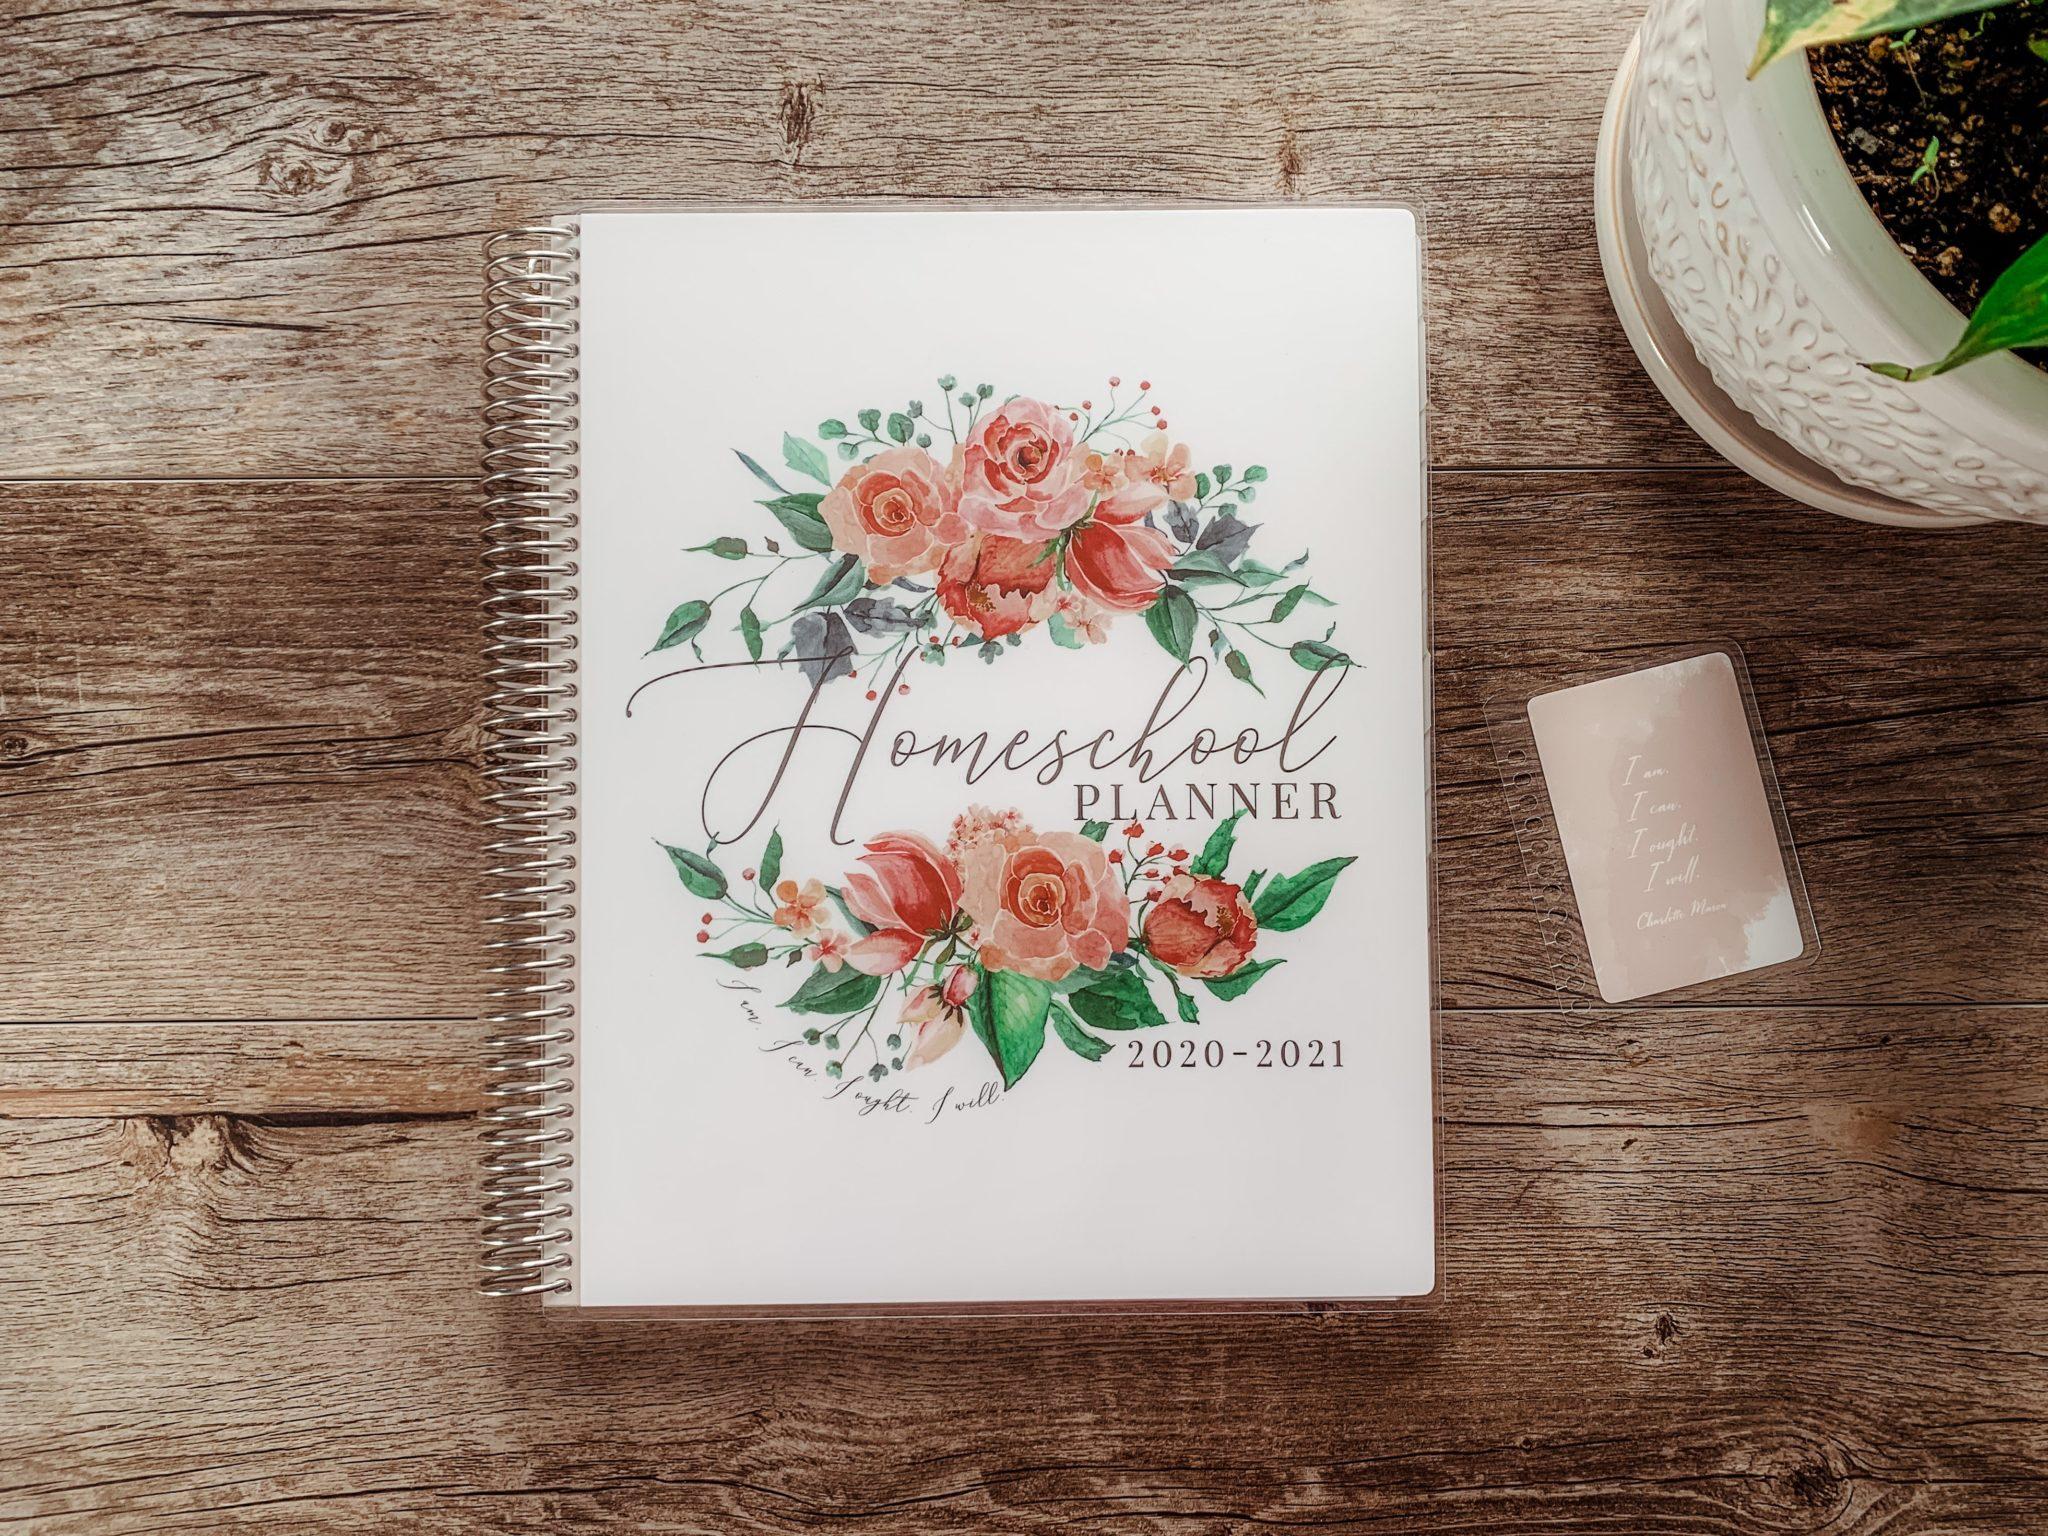 Charlotte Mason Inspired Homeschool Planner - ahumbleplace.com